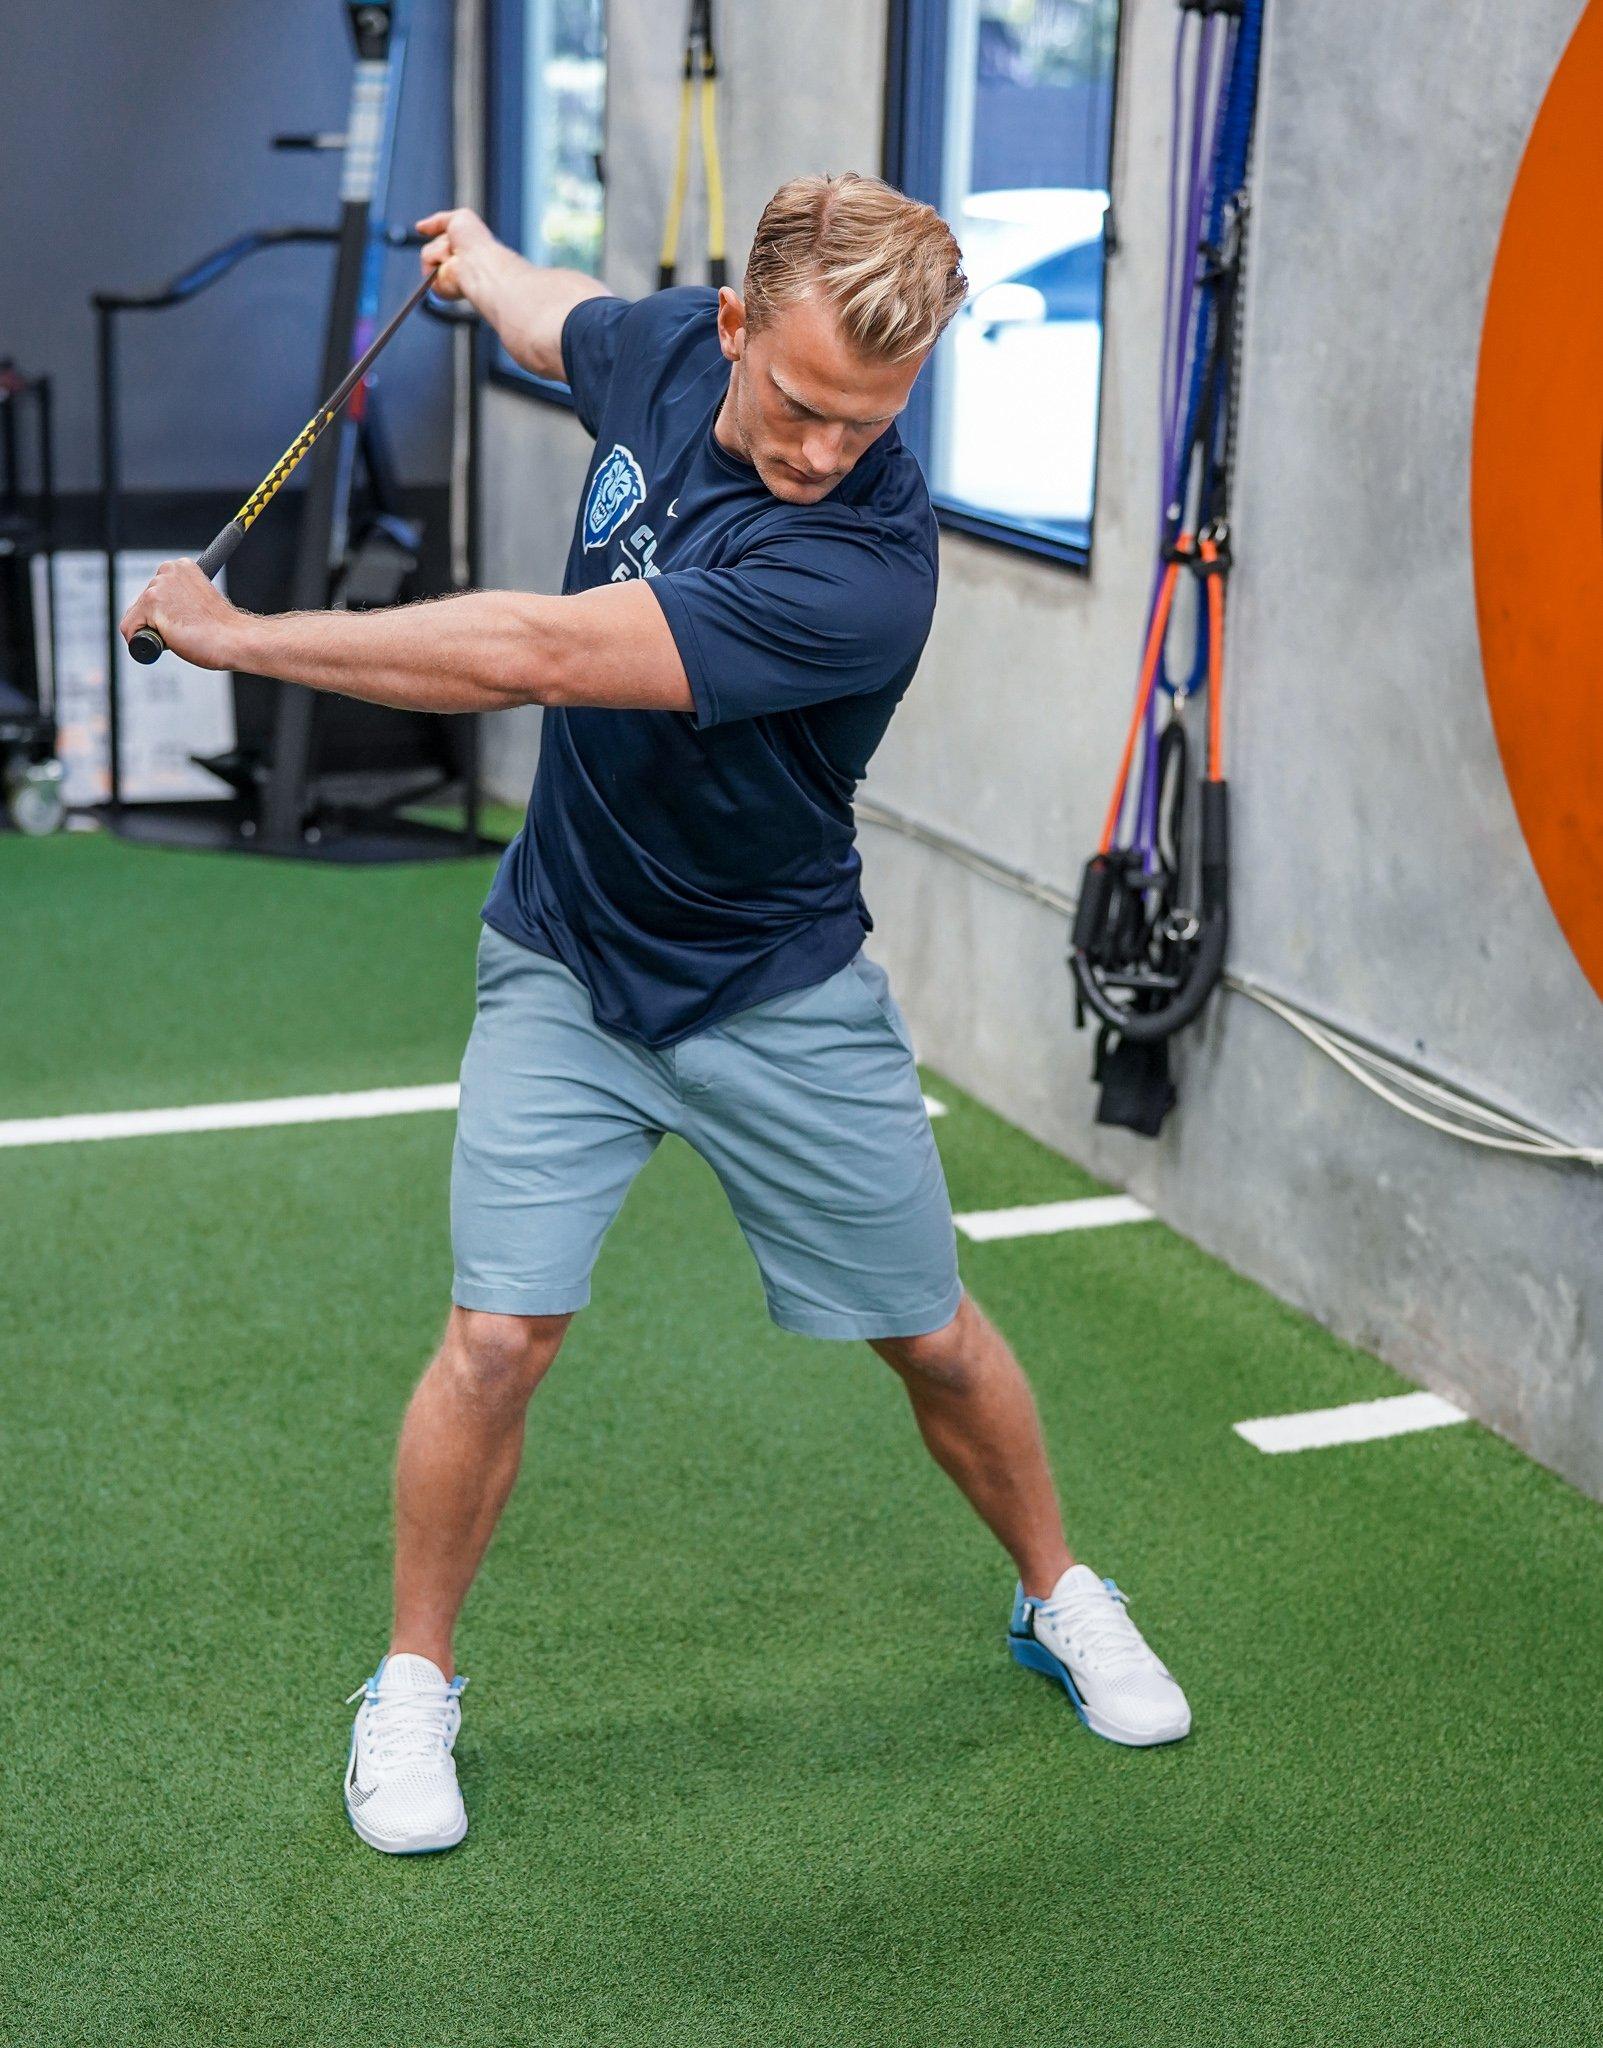 drill mimicking swing follow-through